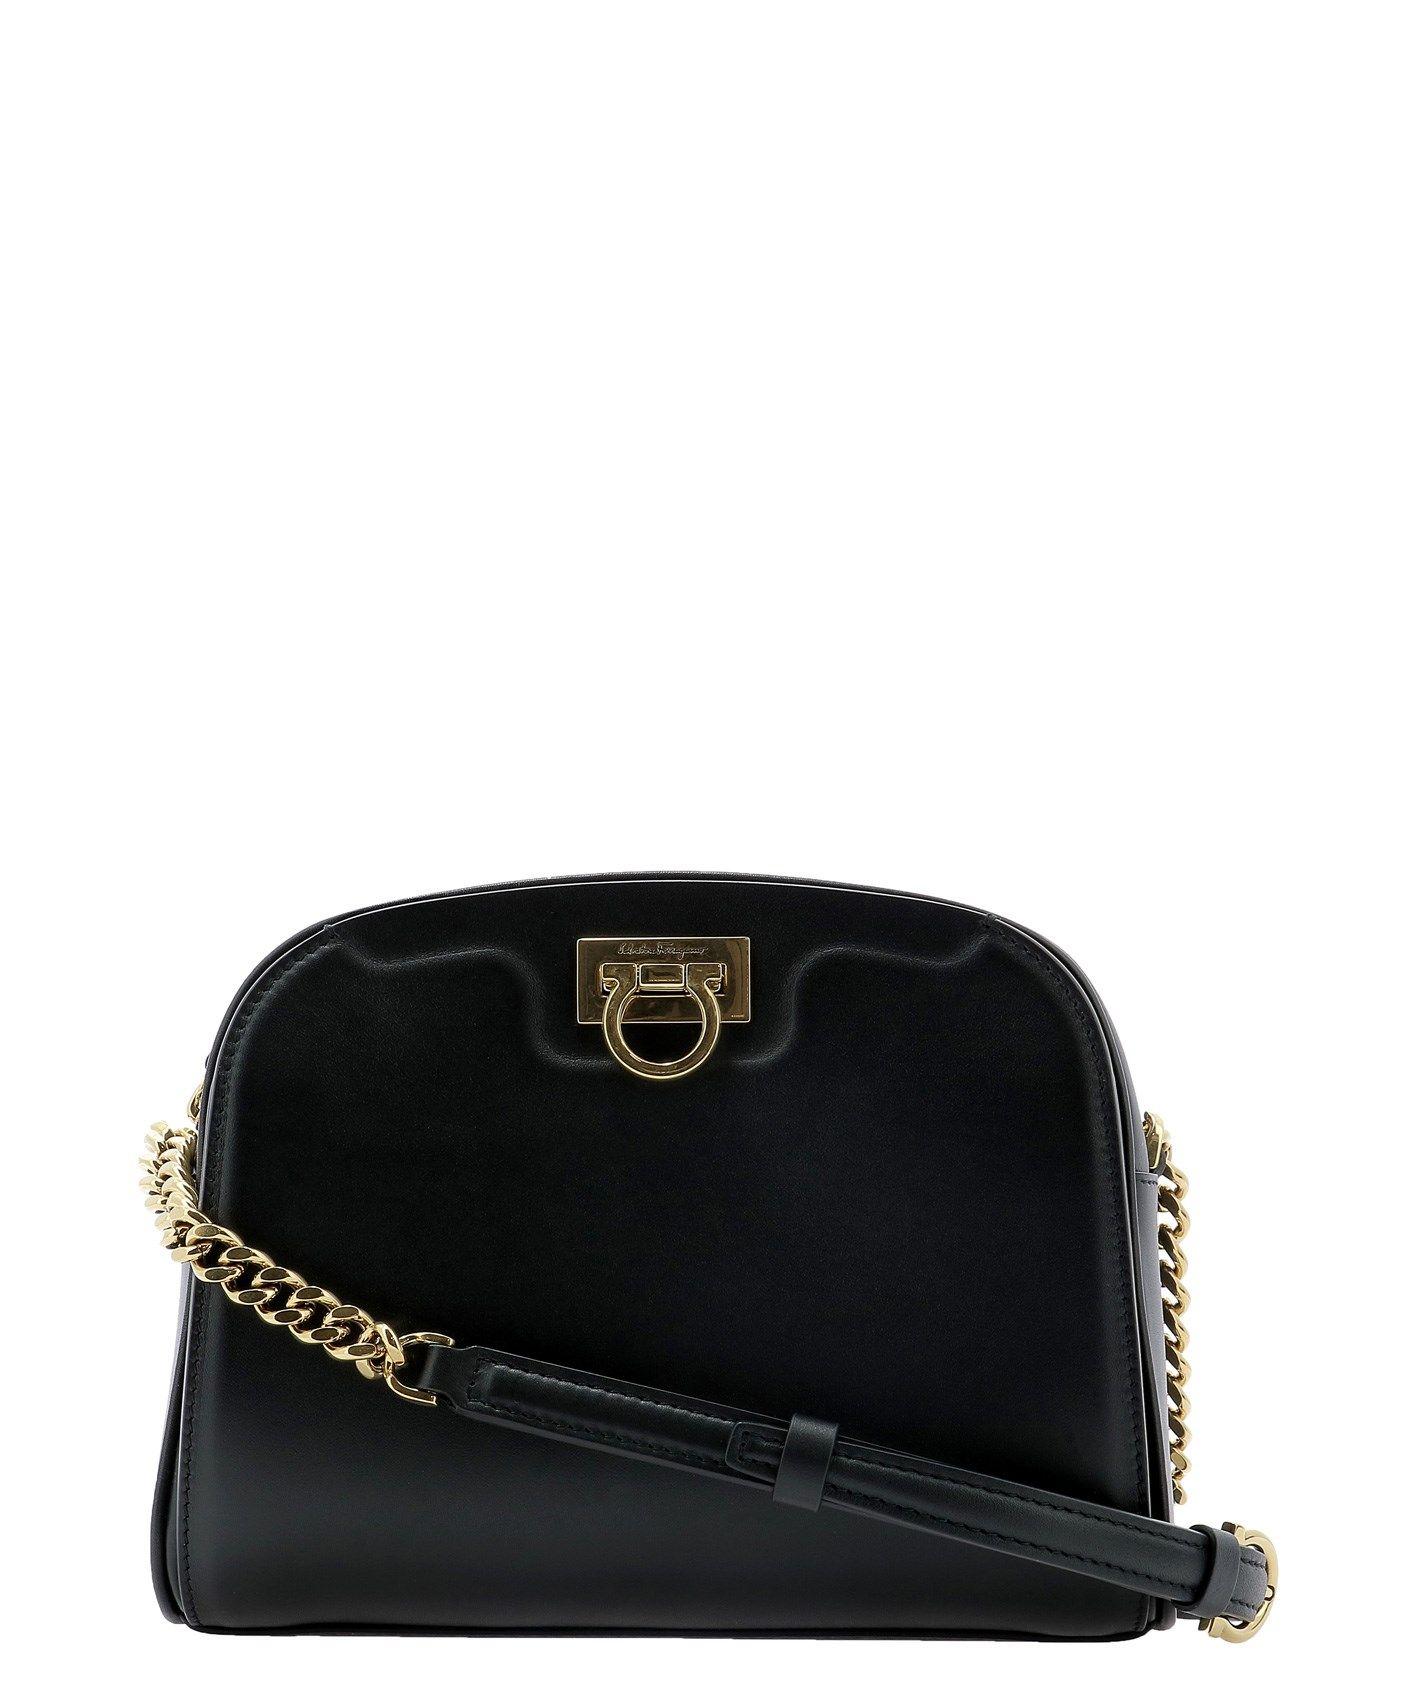 Salvatore Ferragamo SALVATORE FERRAGAMO WOMEN'S BLACK OTHER MATERIALS SHOULDER BAG